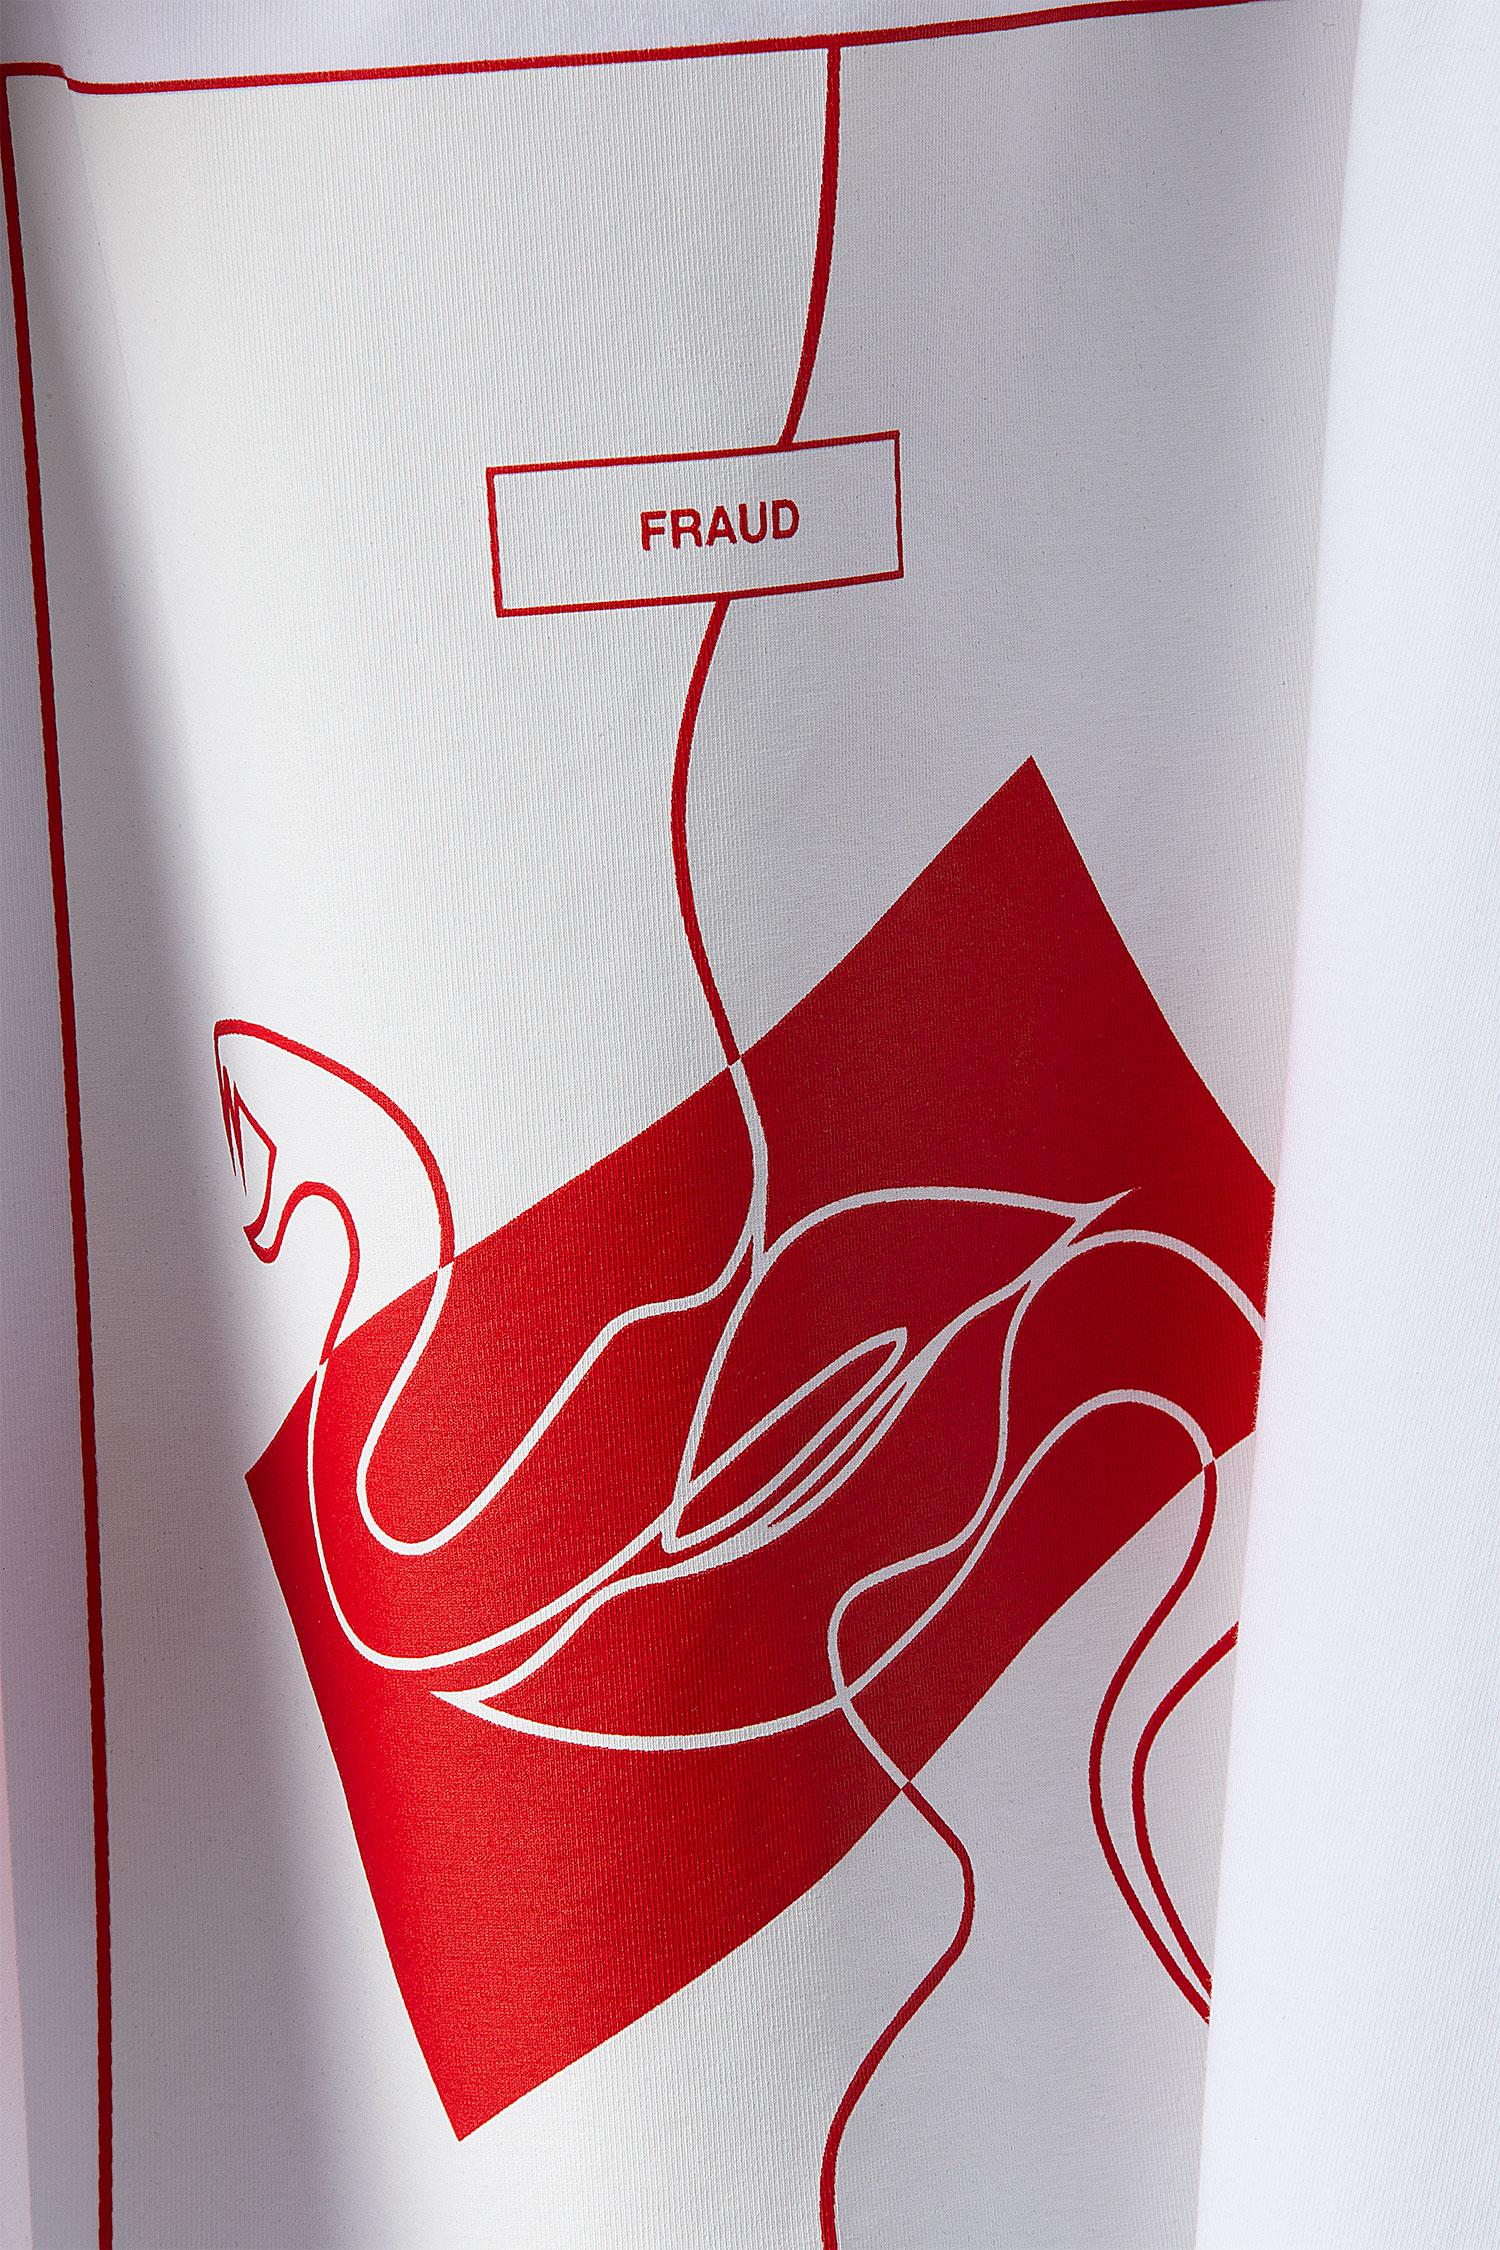 REND_Fraud-white